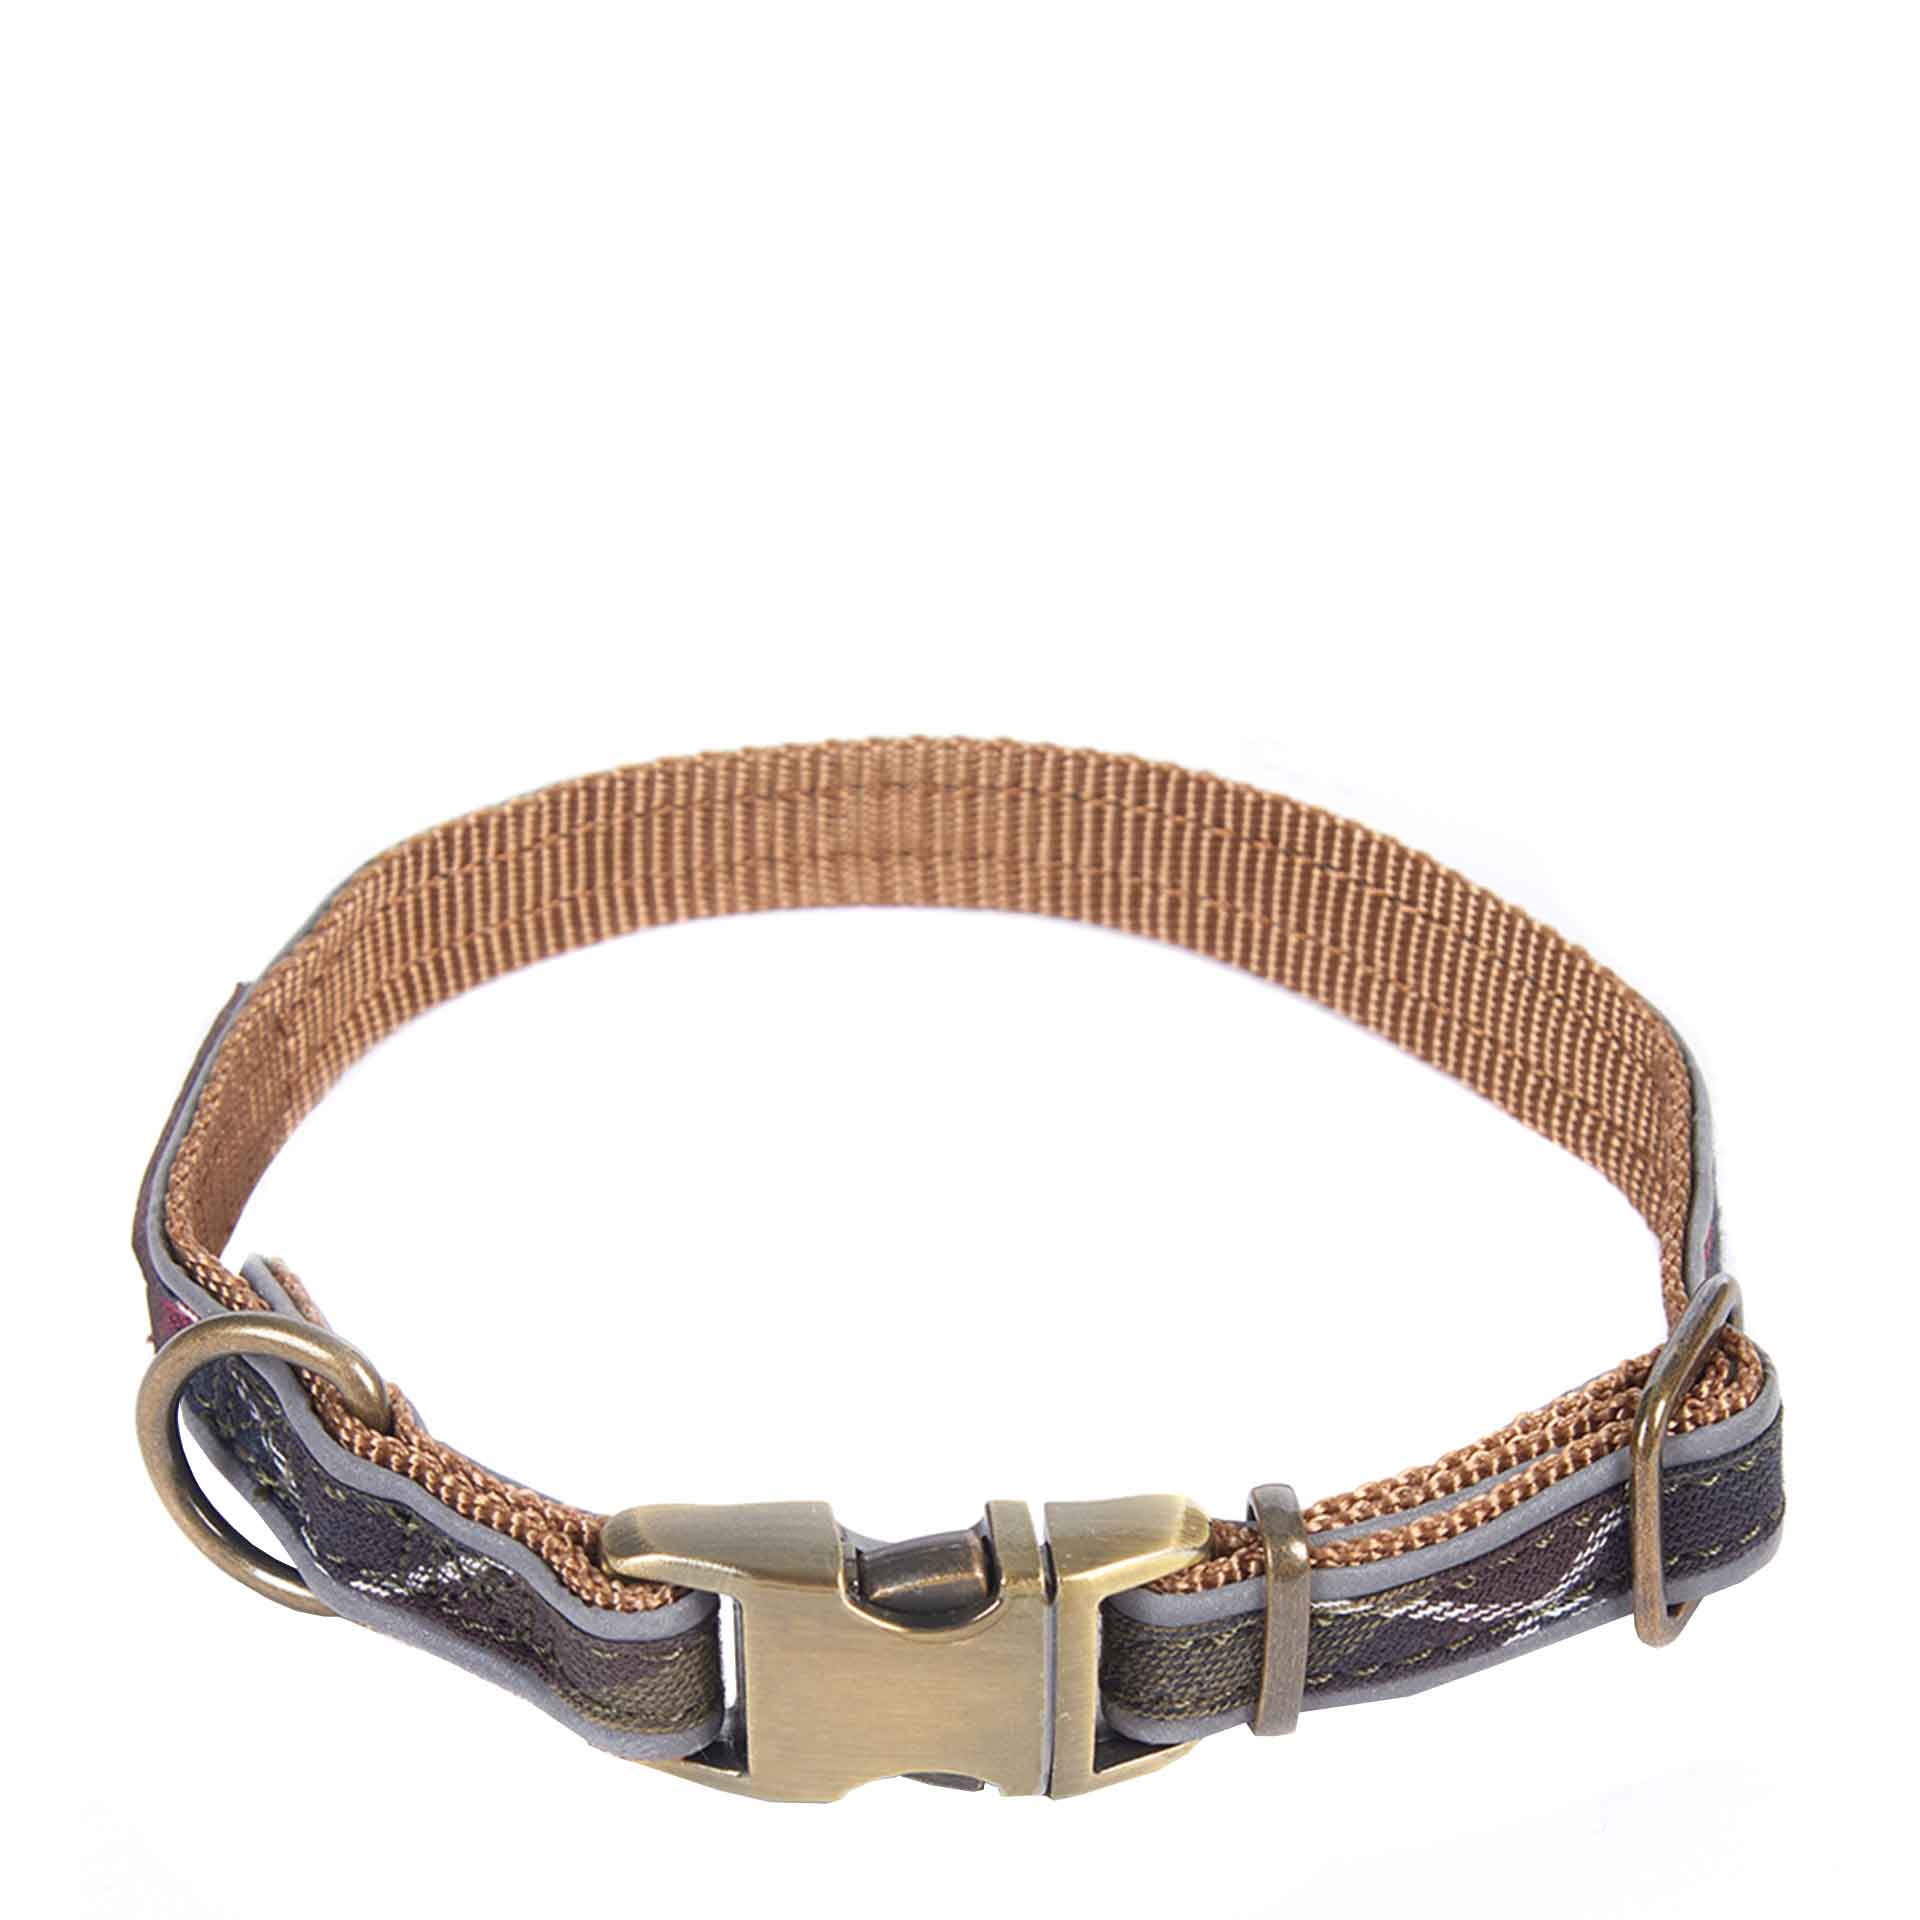 Barbour Reflective Tartan Hunde Halsband L classic tartan